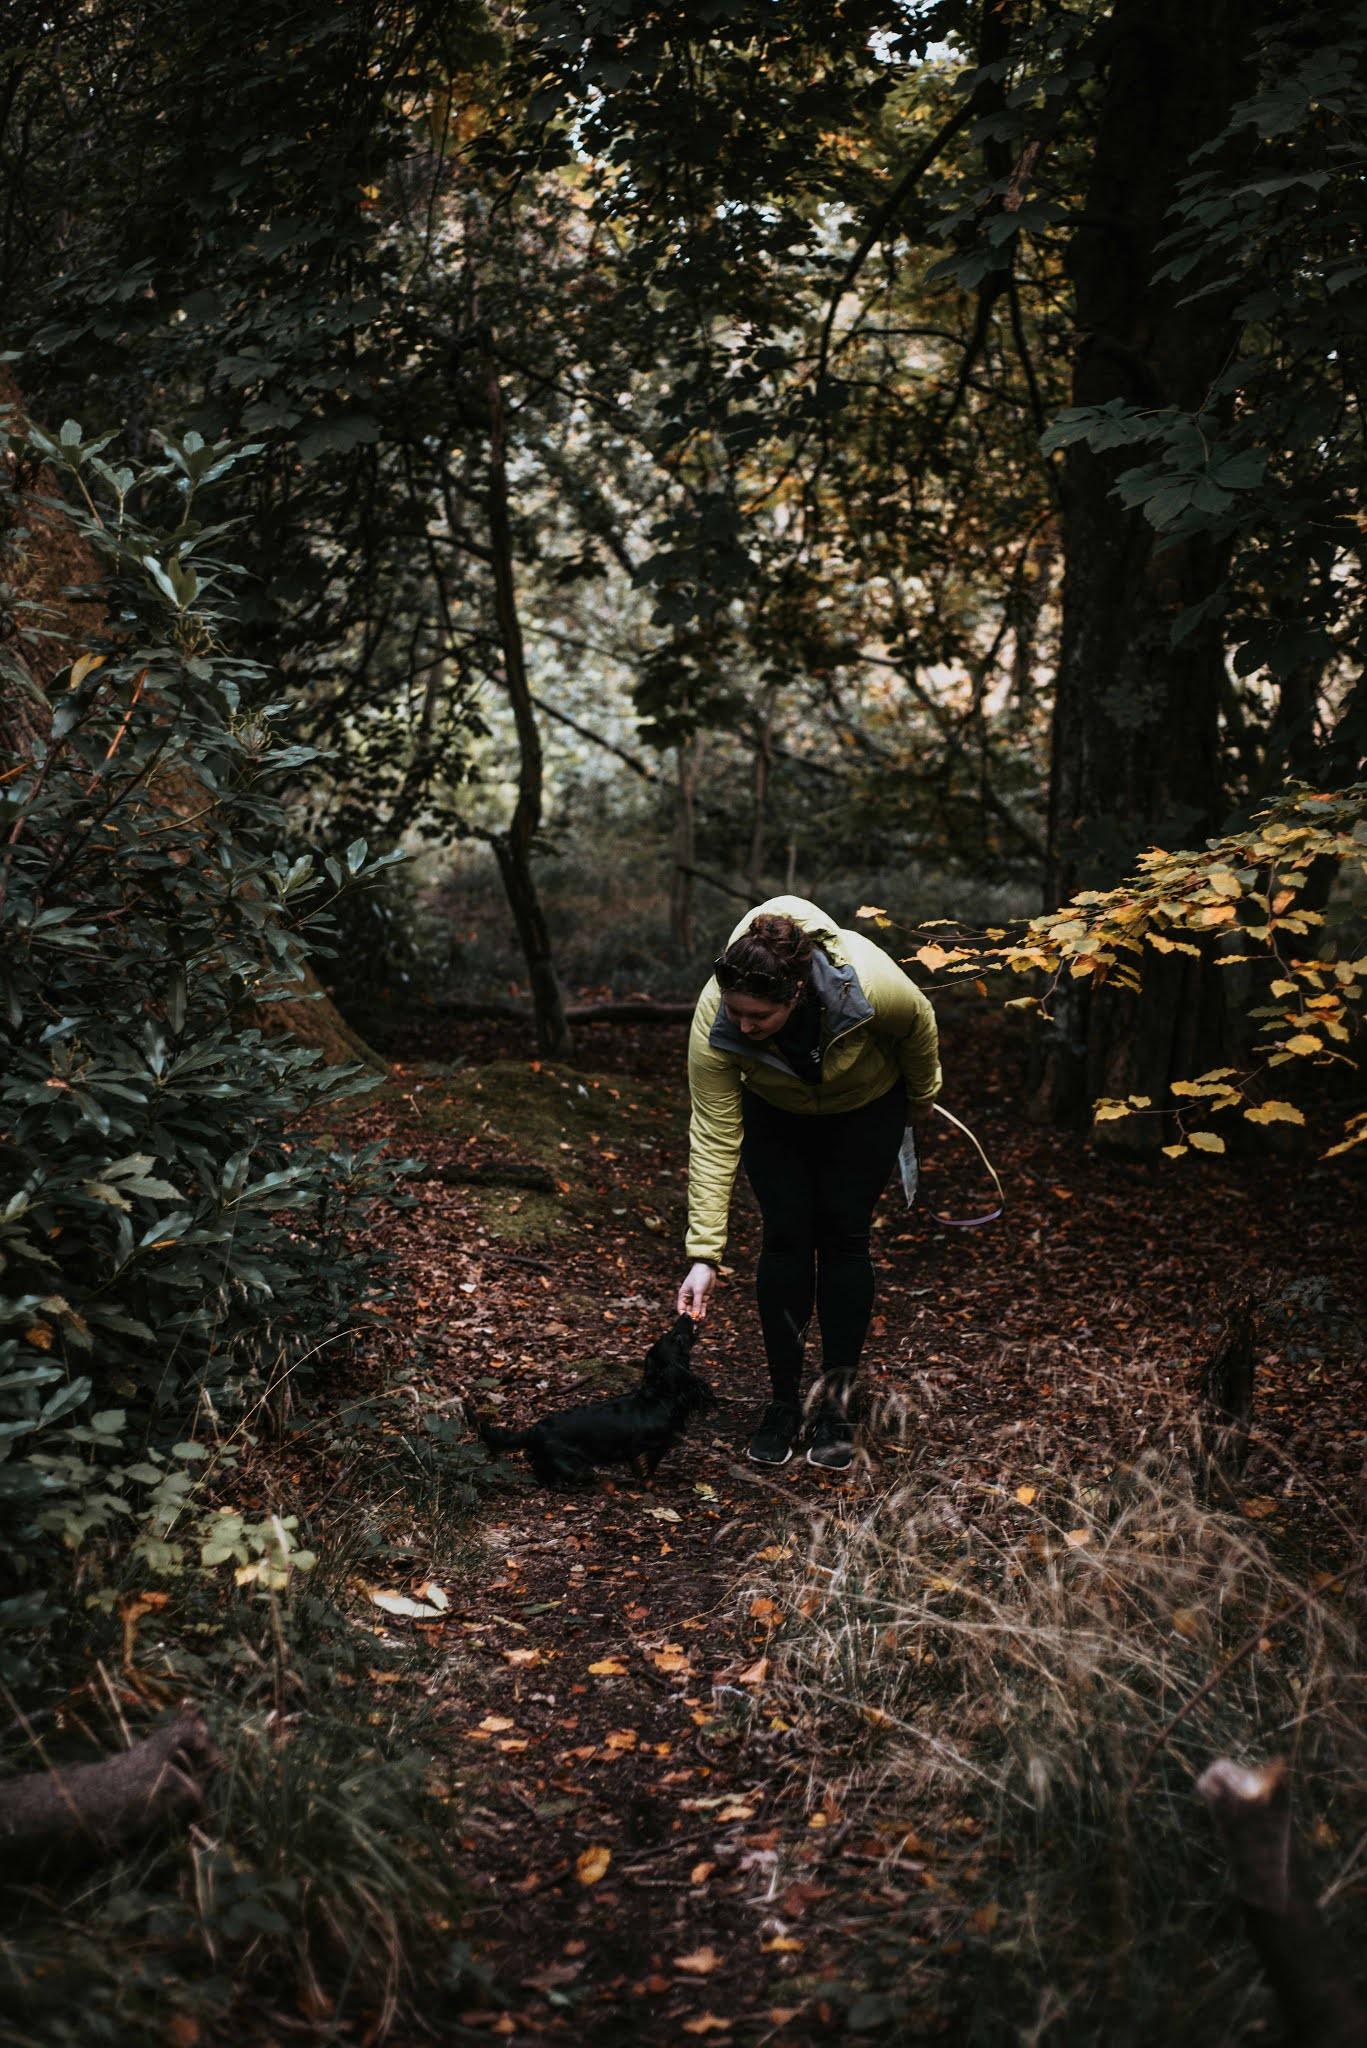 dachshund cocker spaniel in woods forest ferns liquid grain liquidgrain